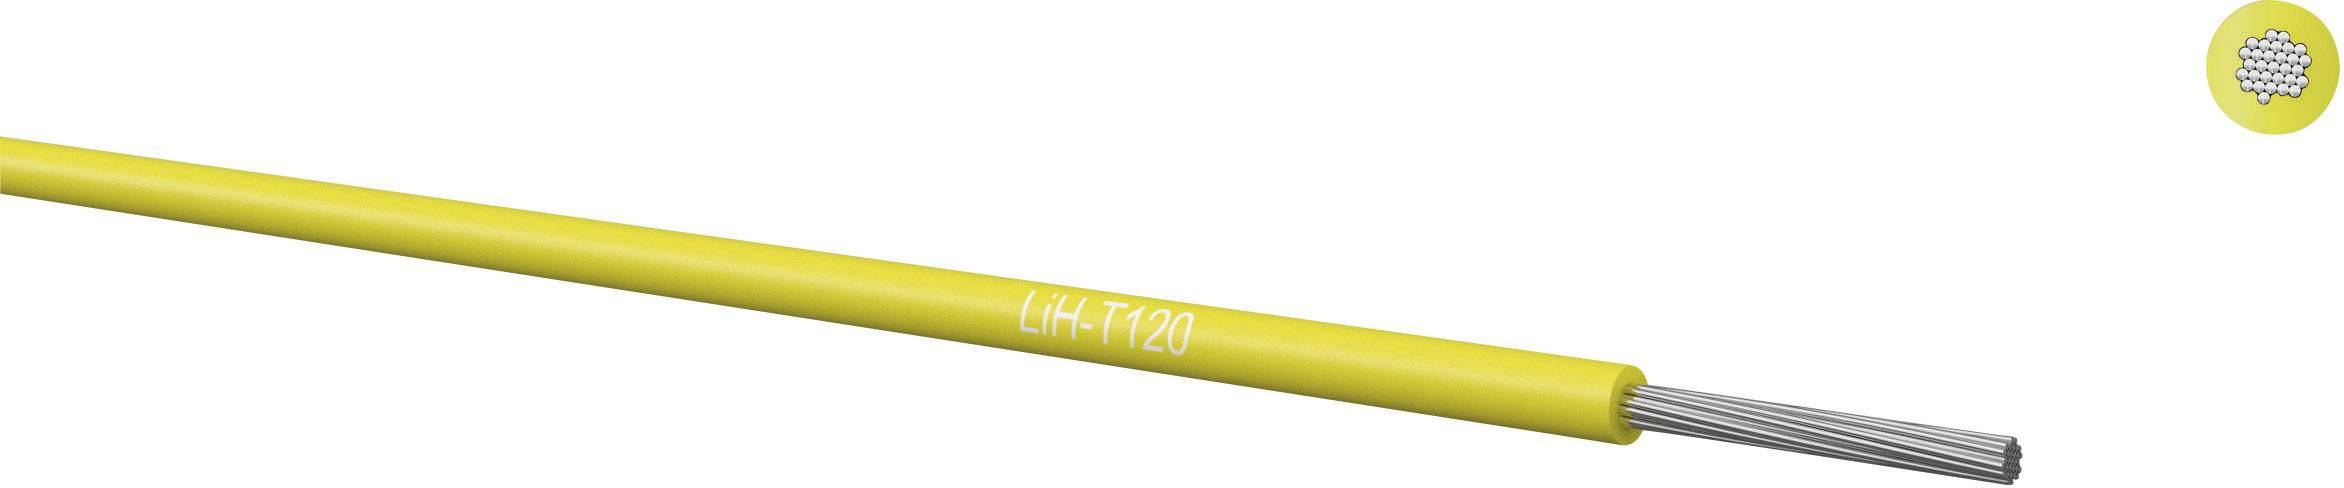 Pletenica LiH-T 1 x 0.14 mm, črna Kabeltronik 065001409 100 m